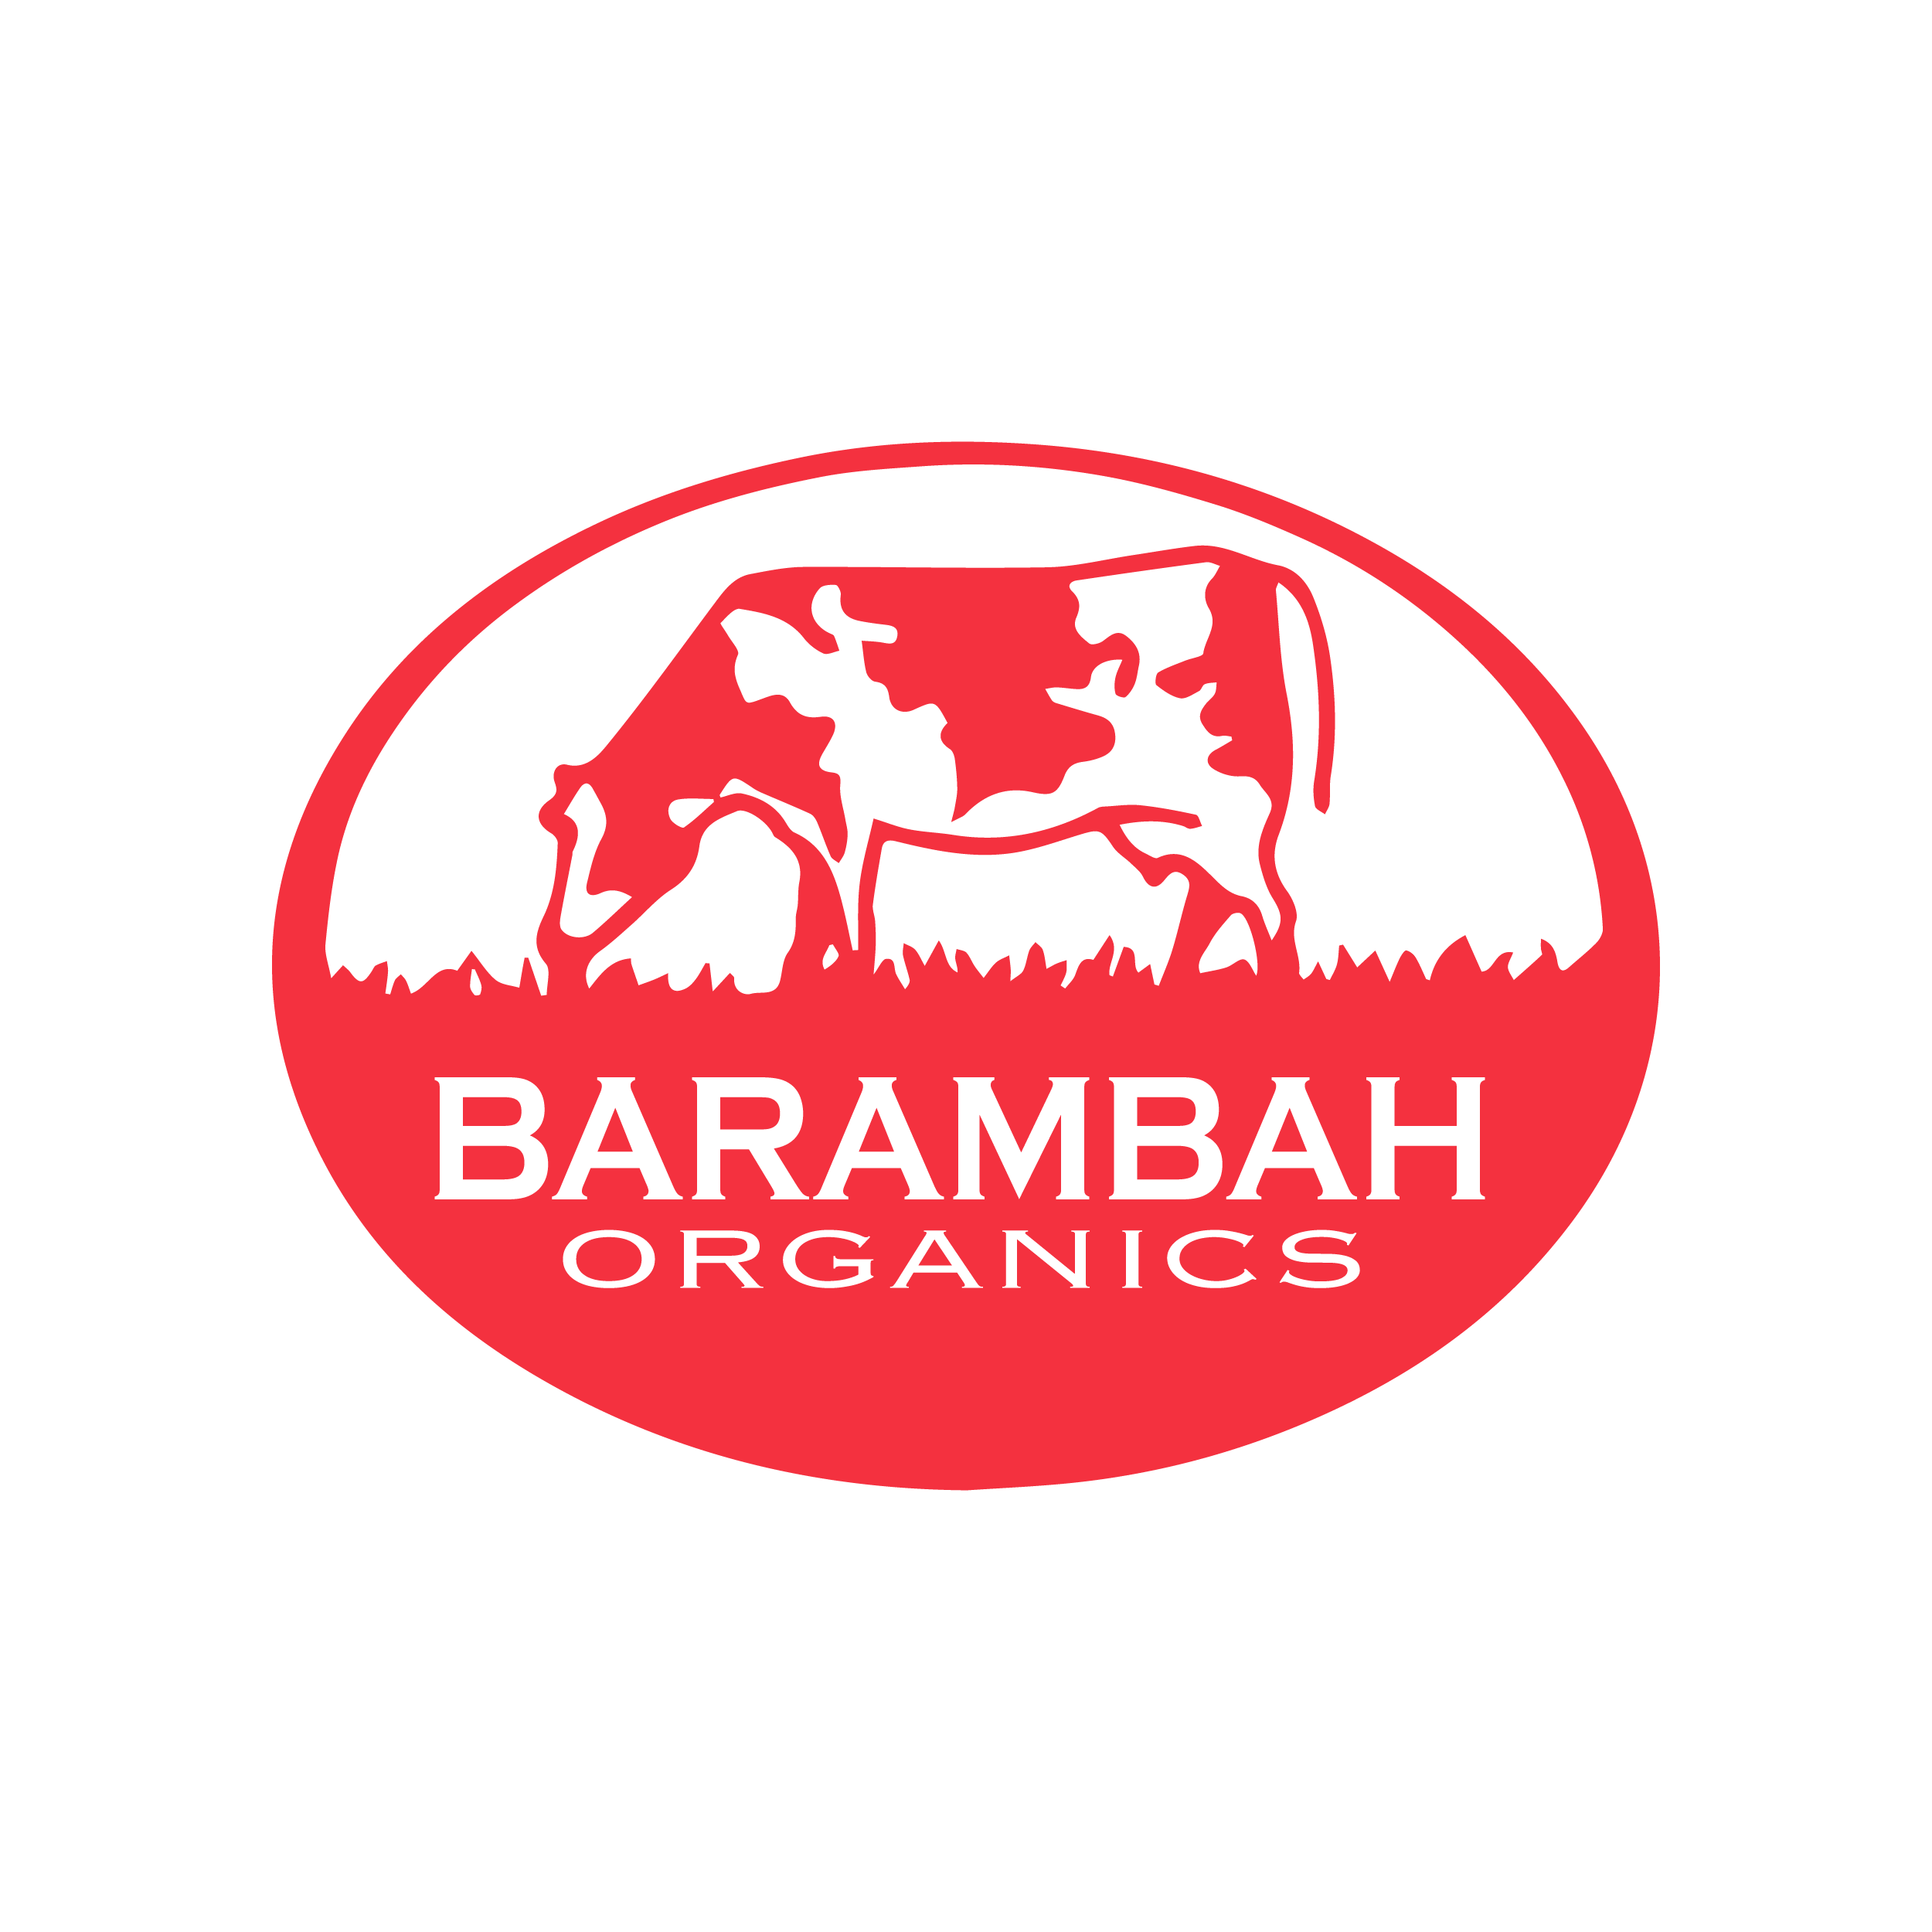 Barambah Organic Pty Ltd